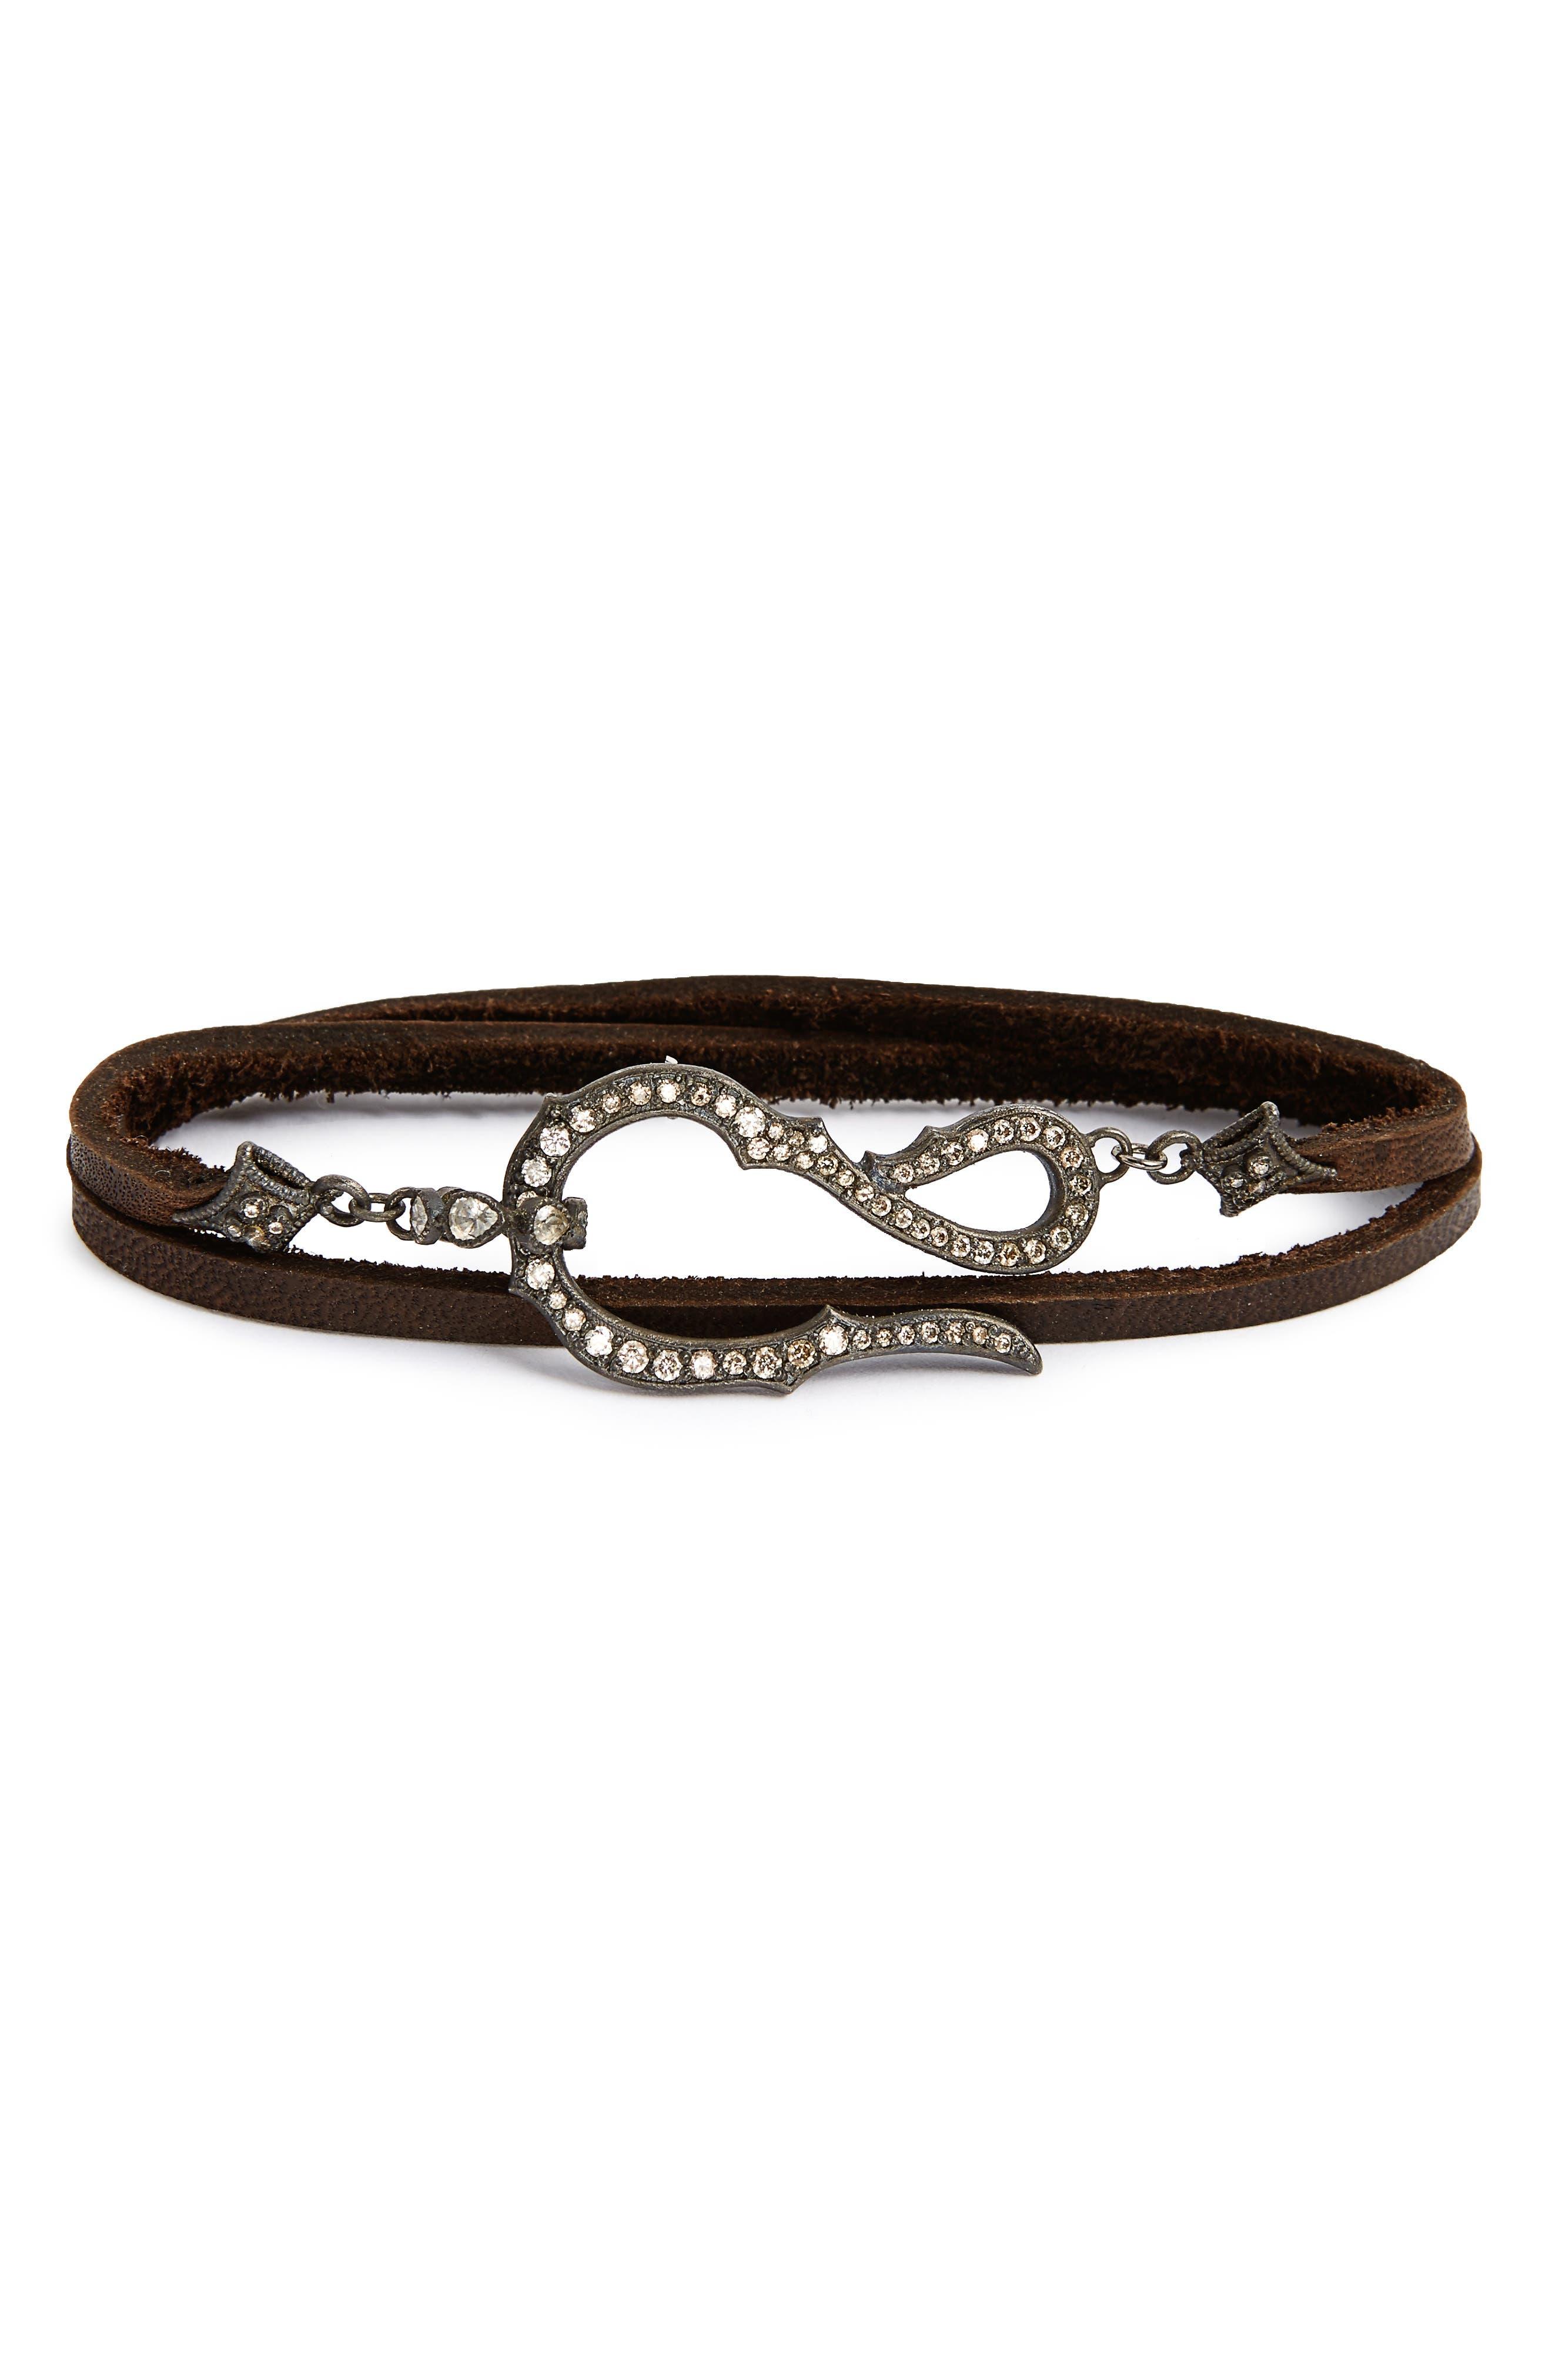 Old World Midnight Leather & Diamond Wrap Bracelet,                             Main thumbnail 1, color,